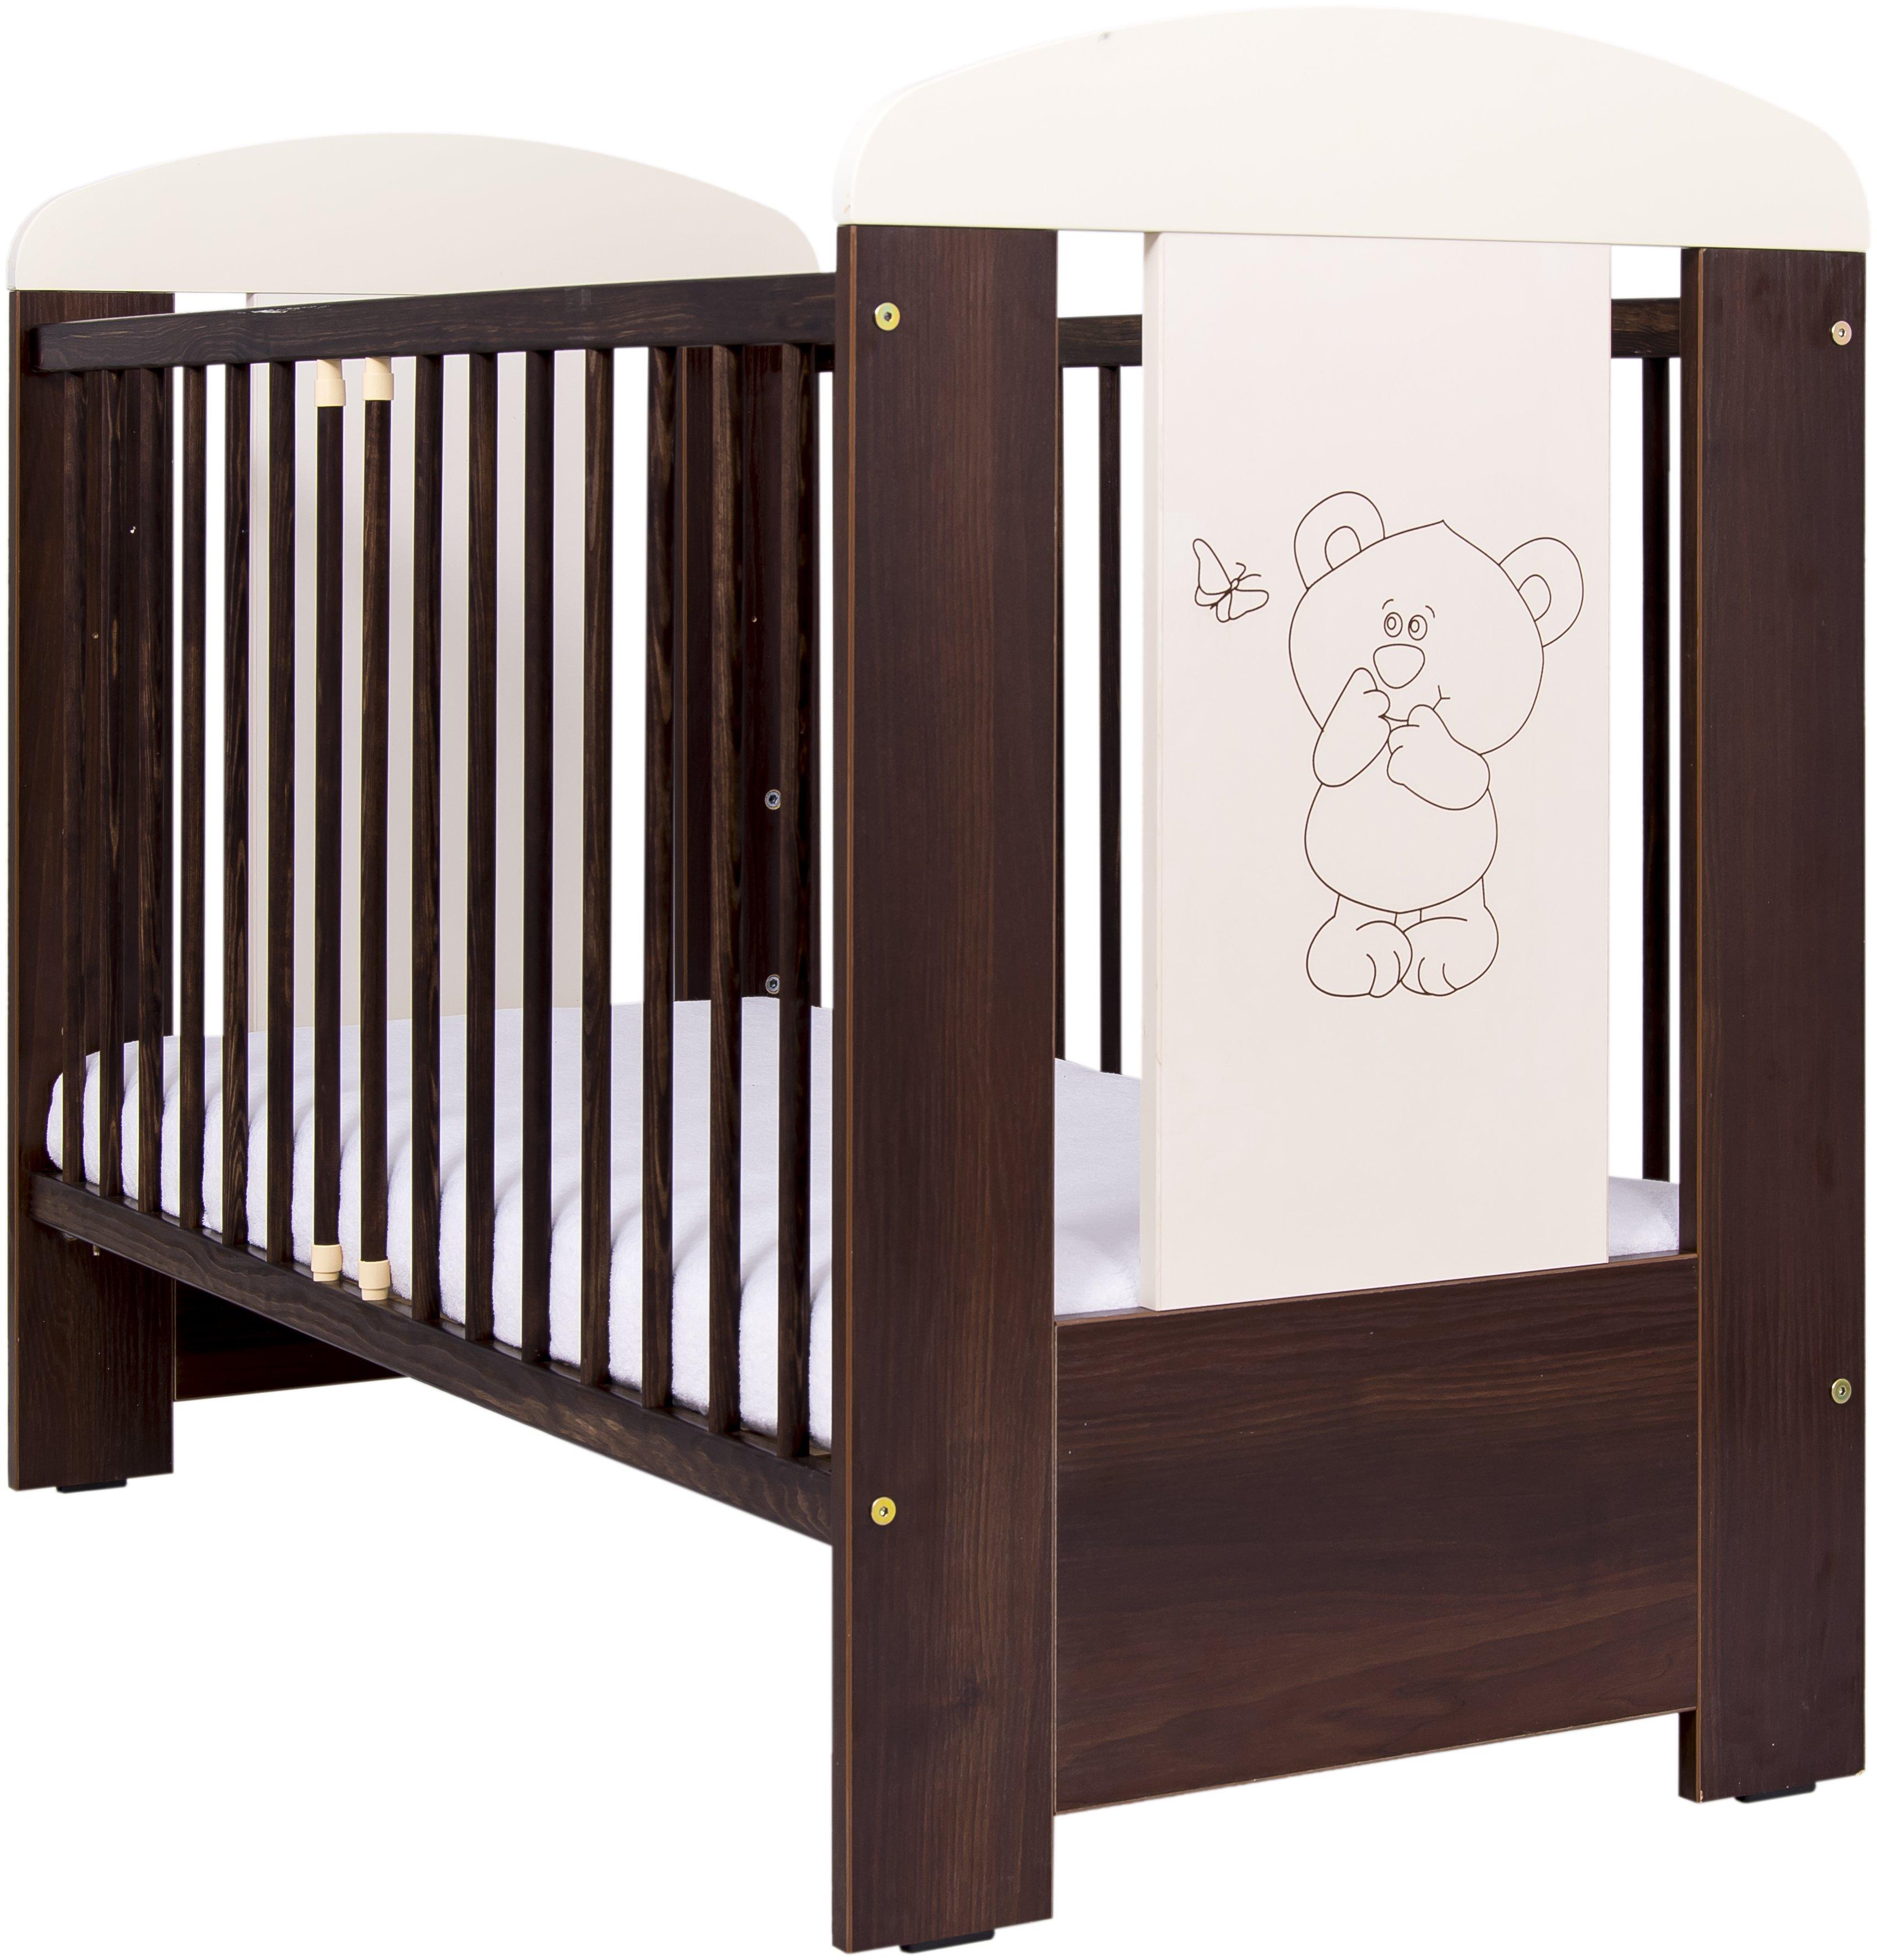 Bērnu gulta Drewex LITTLE BEAR and BUTTERFLY (Maly Miš i Motylek)  nut/riekstu